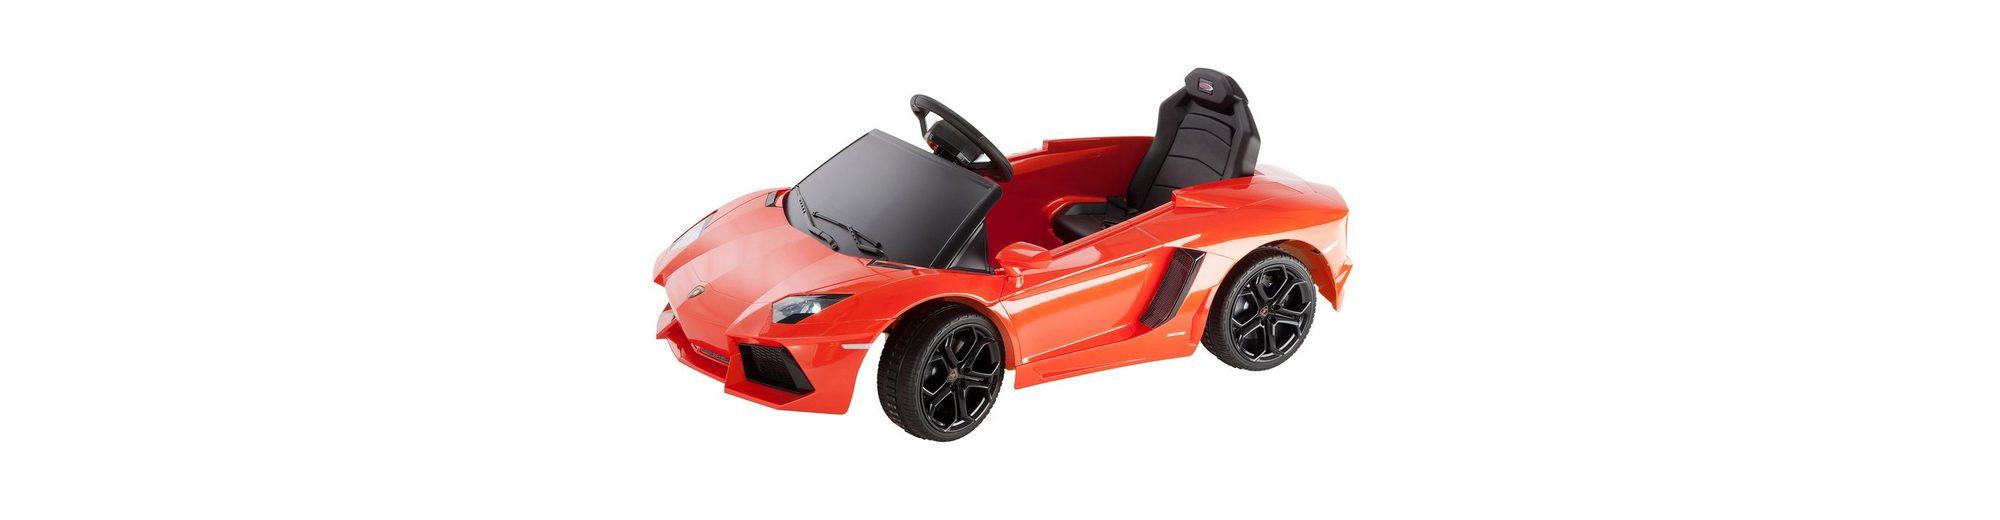 JAMARA Kinder-Fahrzeug, »Ride-On Lamborghini Aventador«